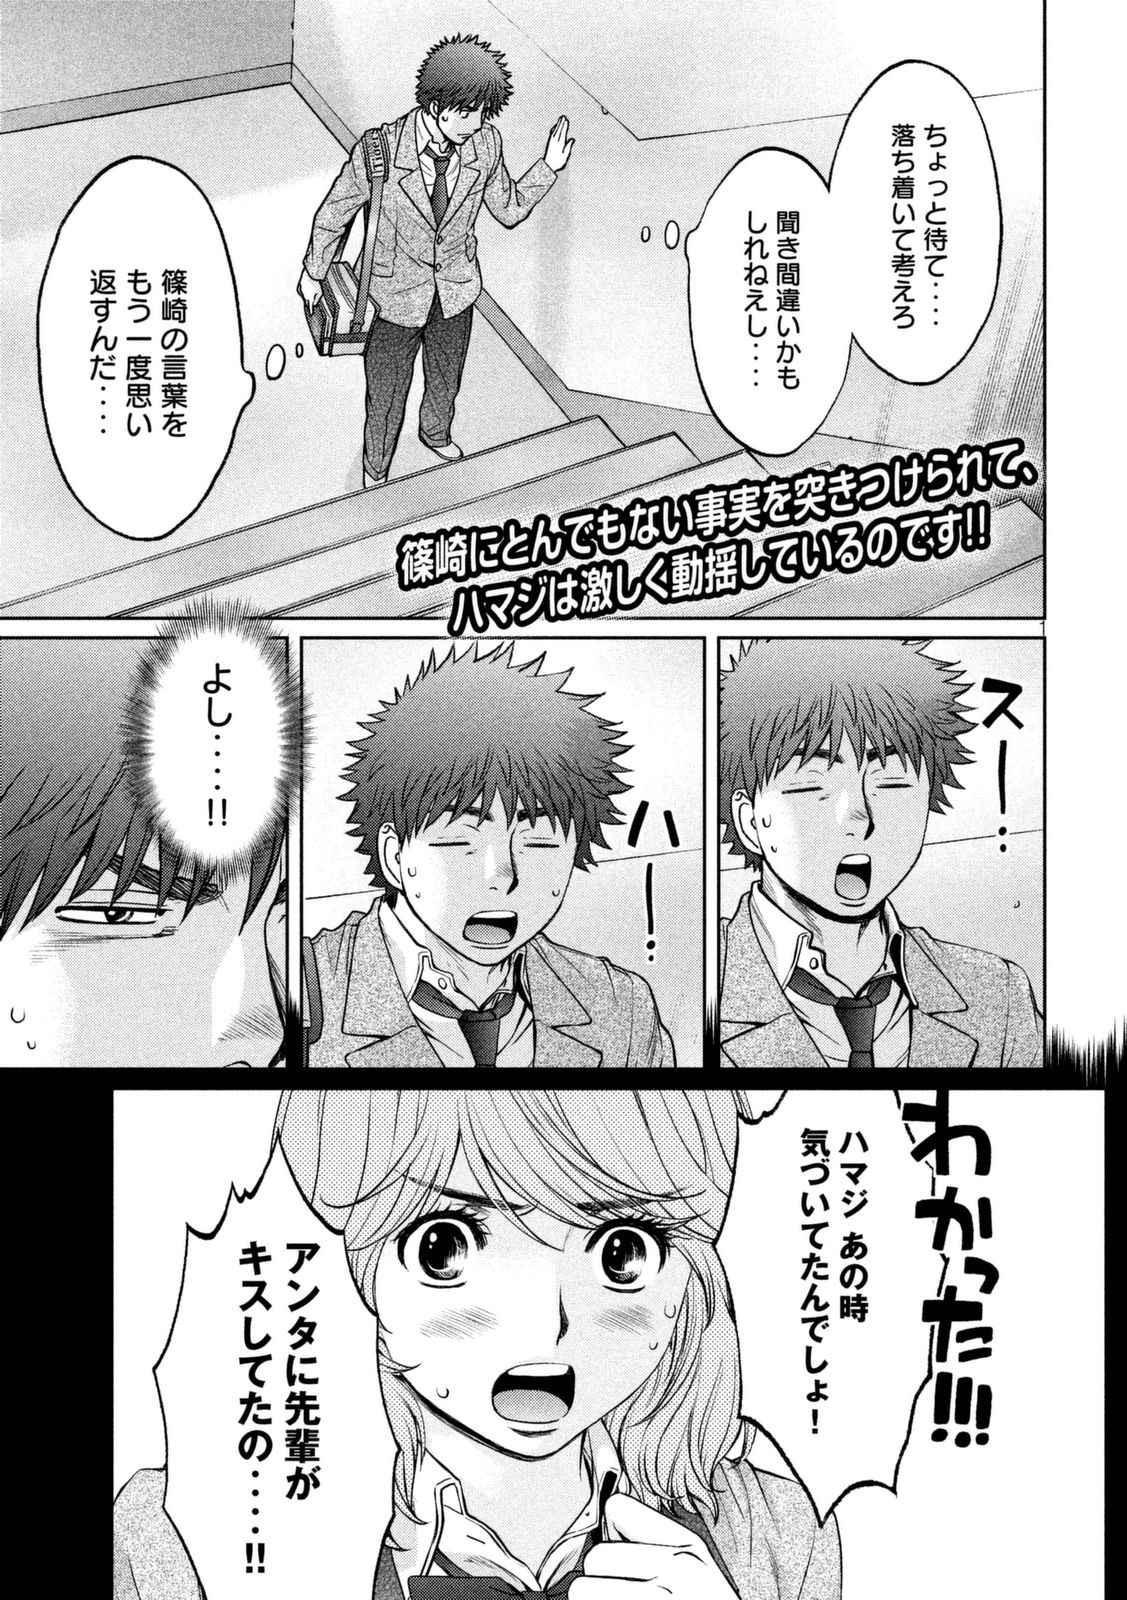 Hantsu_x_Trash Chapter 144 Page 1